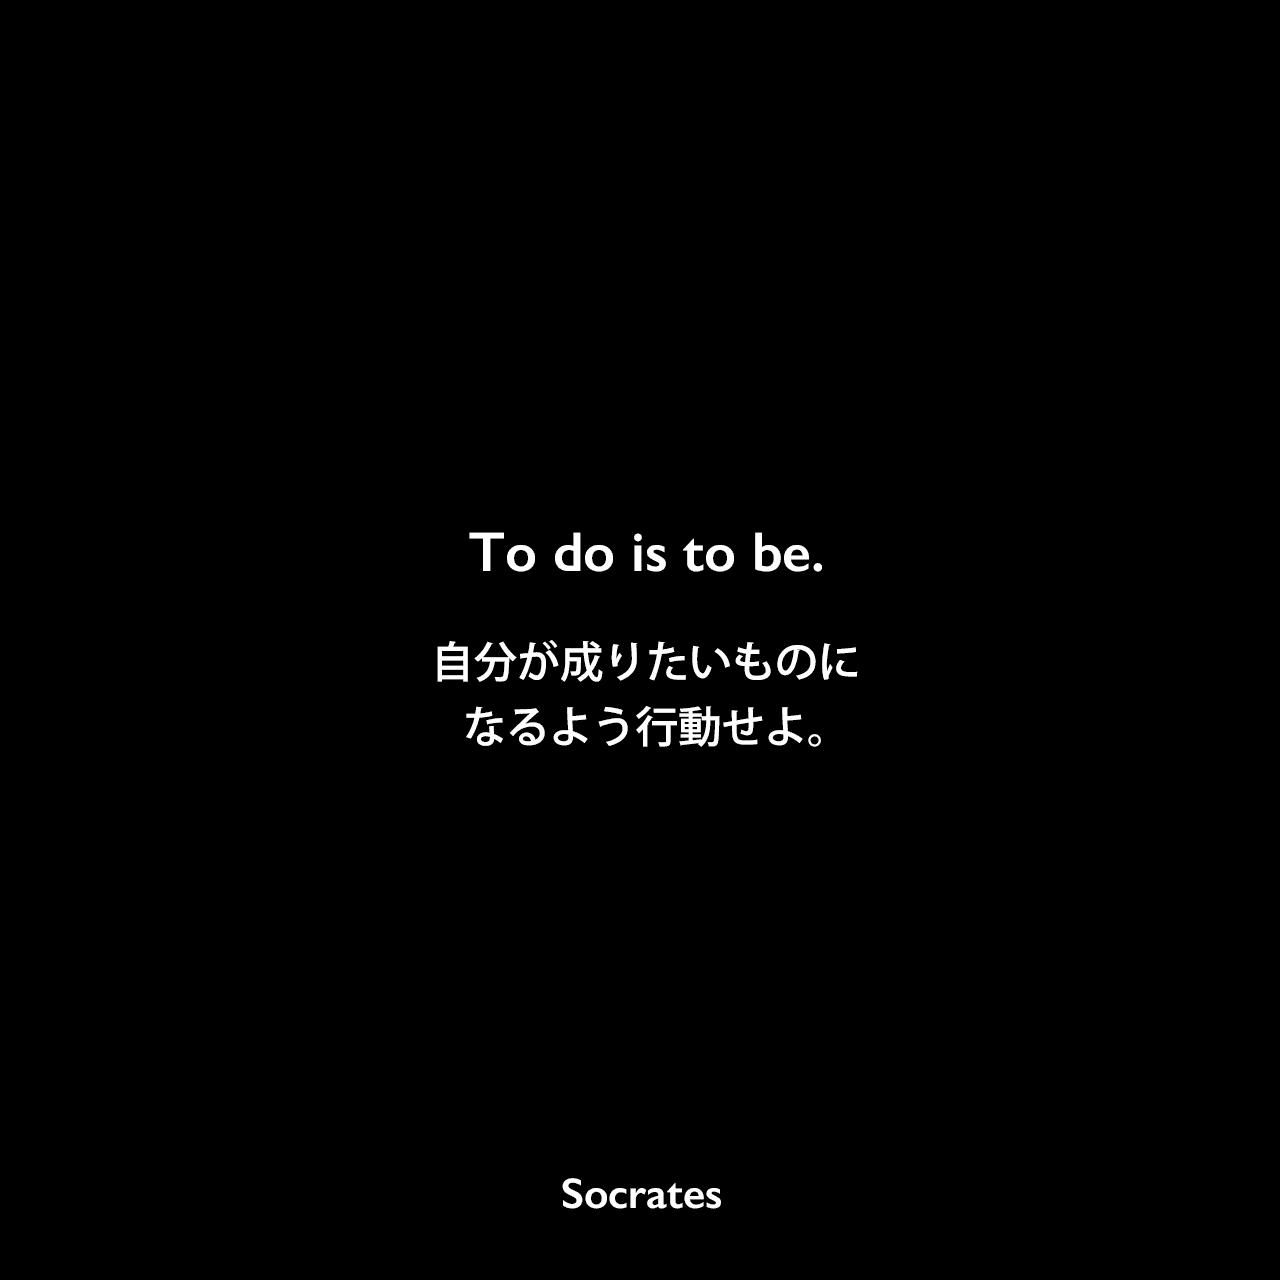 To do is to be.自分が成りたいものになるよう行動せよ。